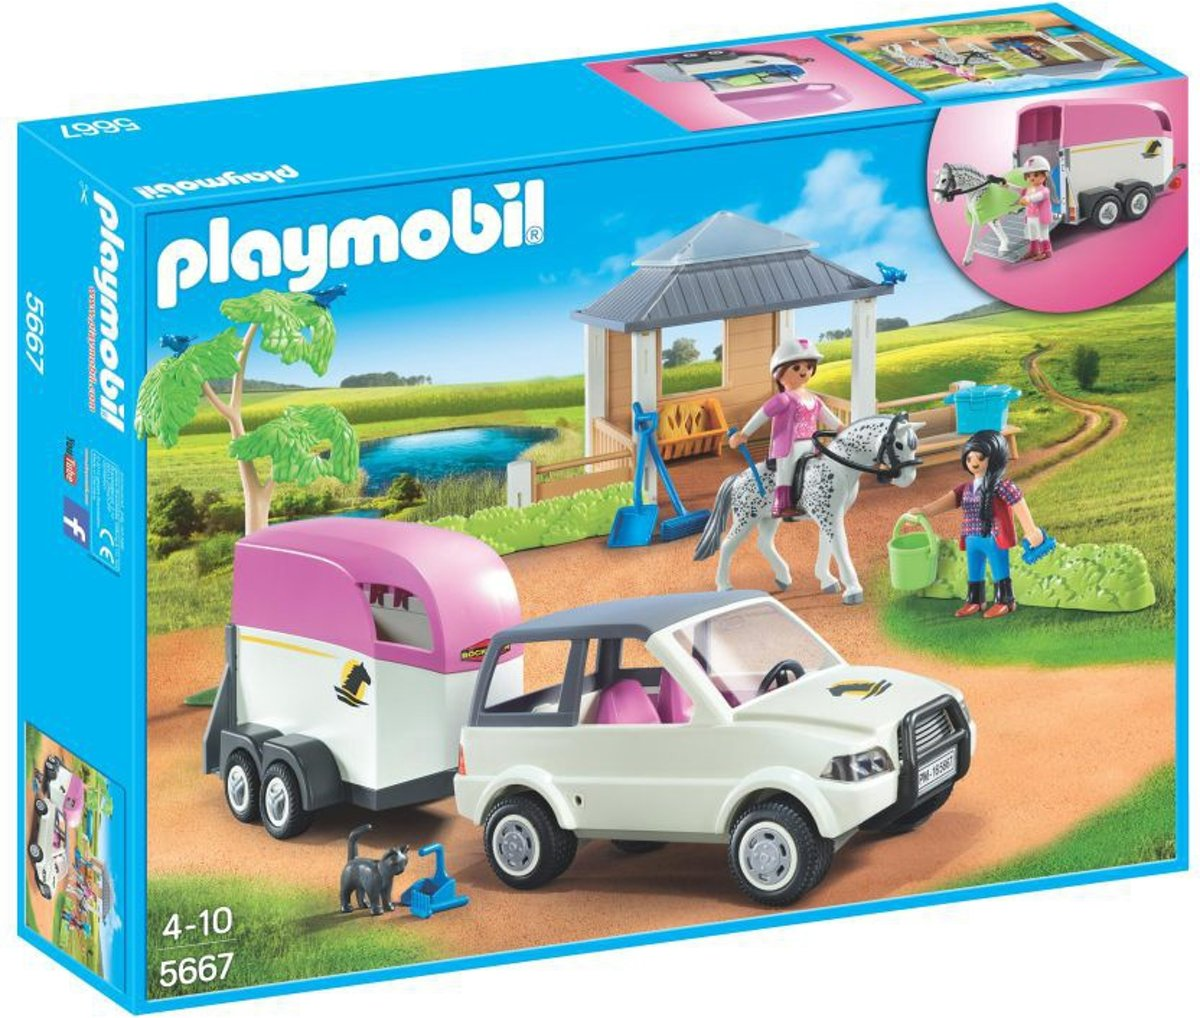 Playmobil paarden transporter